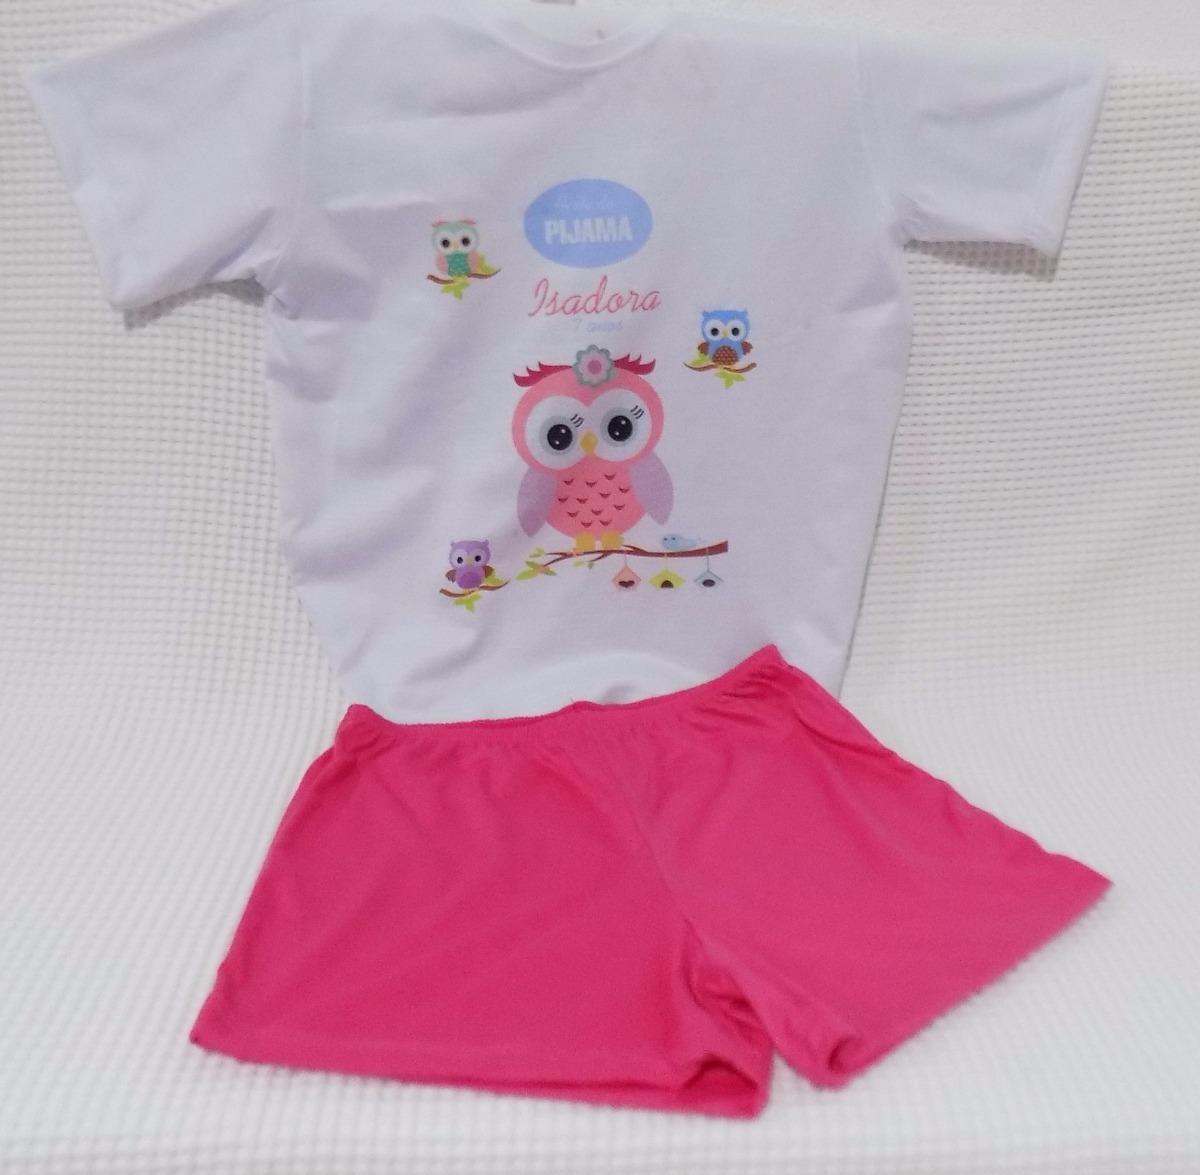 2c219357fd626b Kit Pijama + Chinelo Personalizados